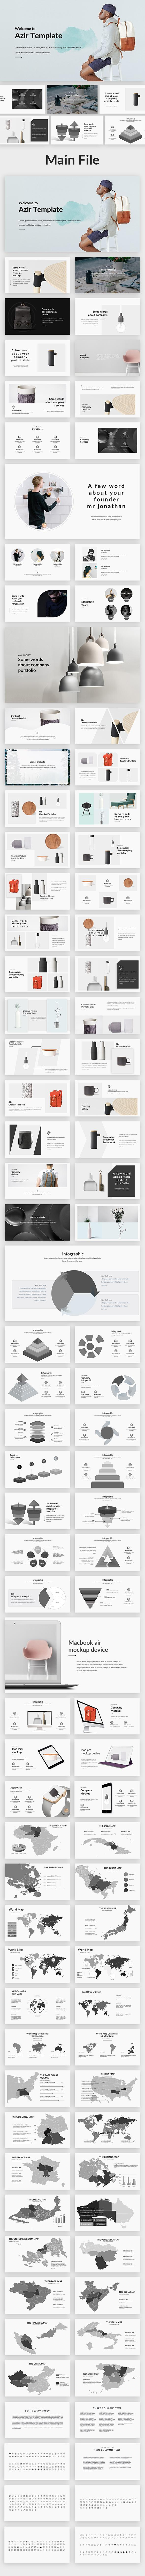 Azir - Creative Google Slide Template - Google Slides Presentation Templates